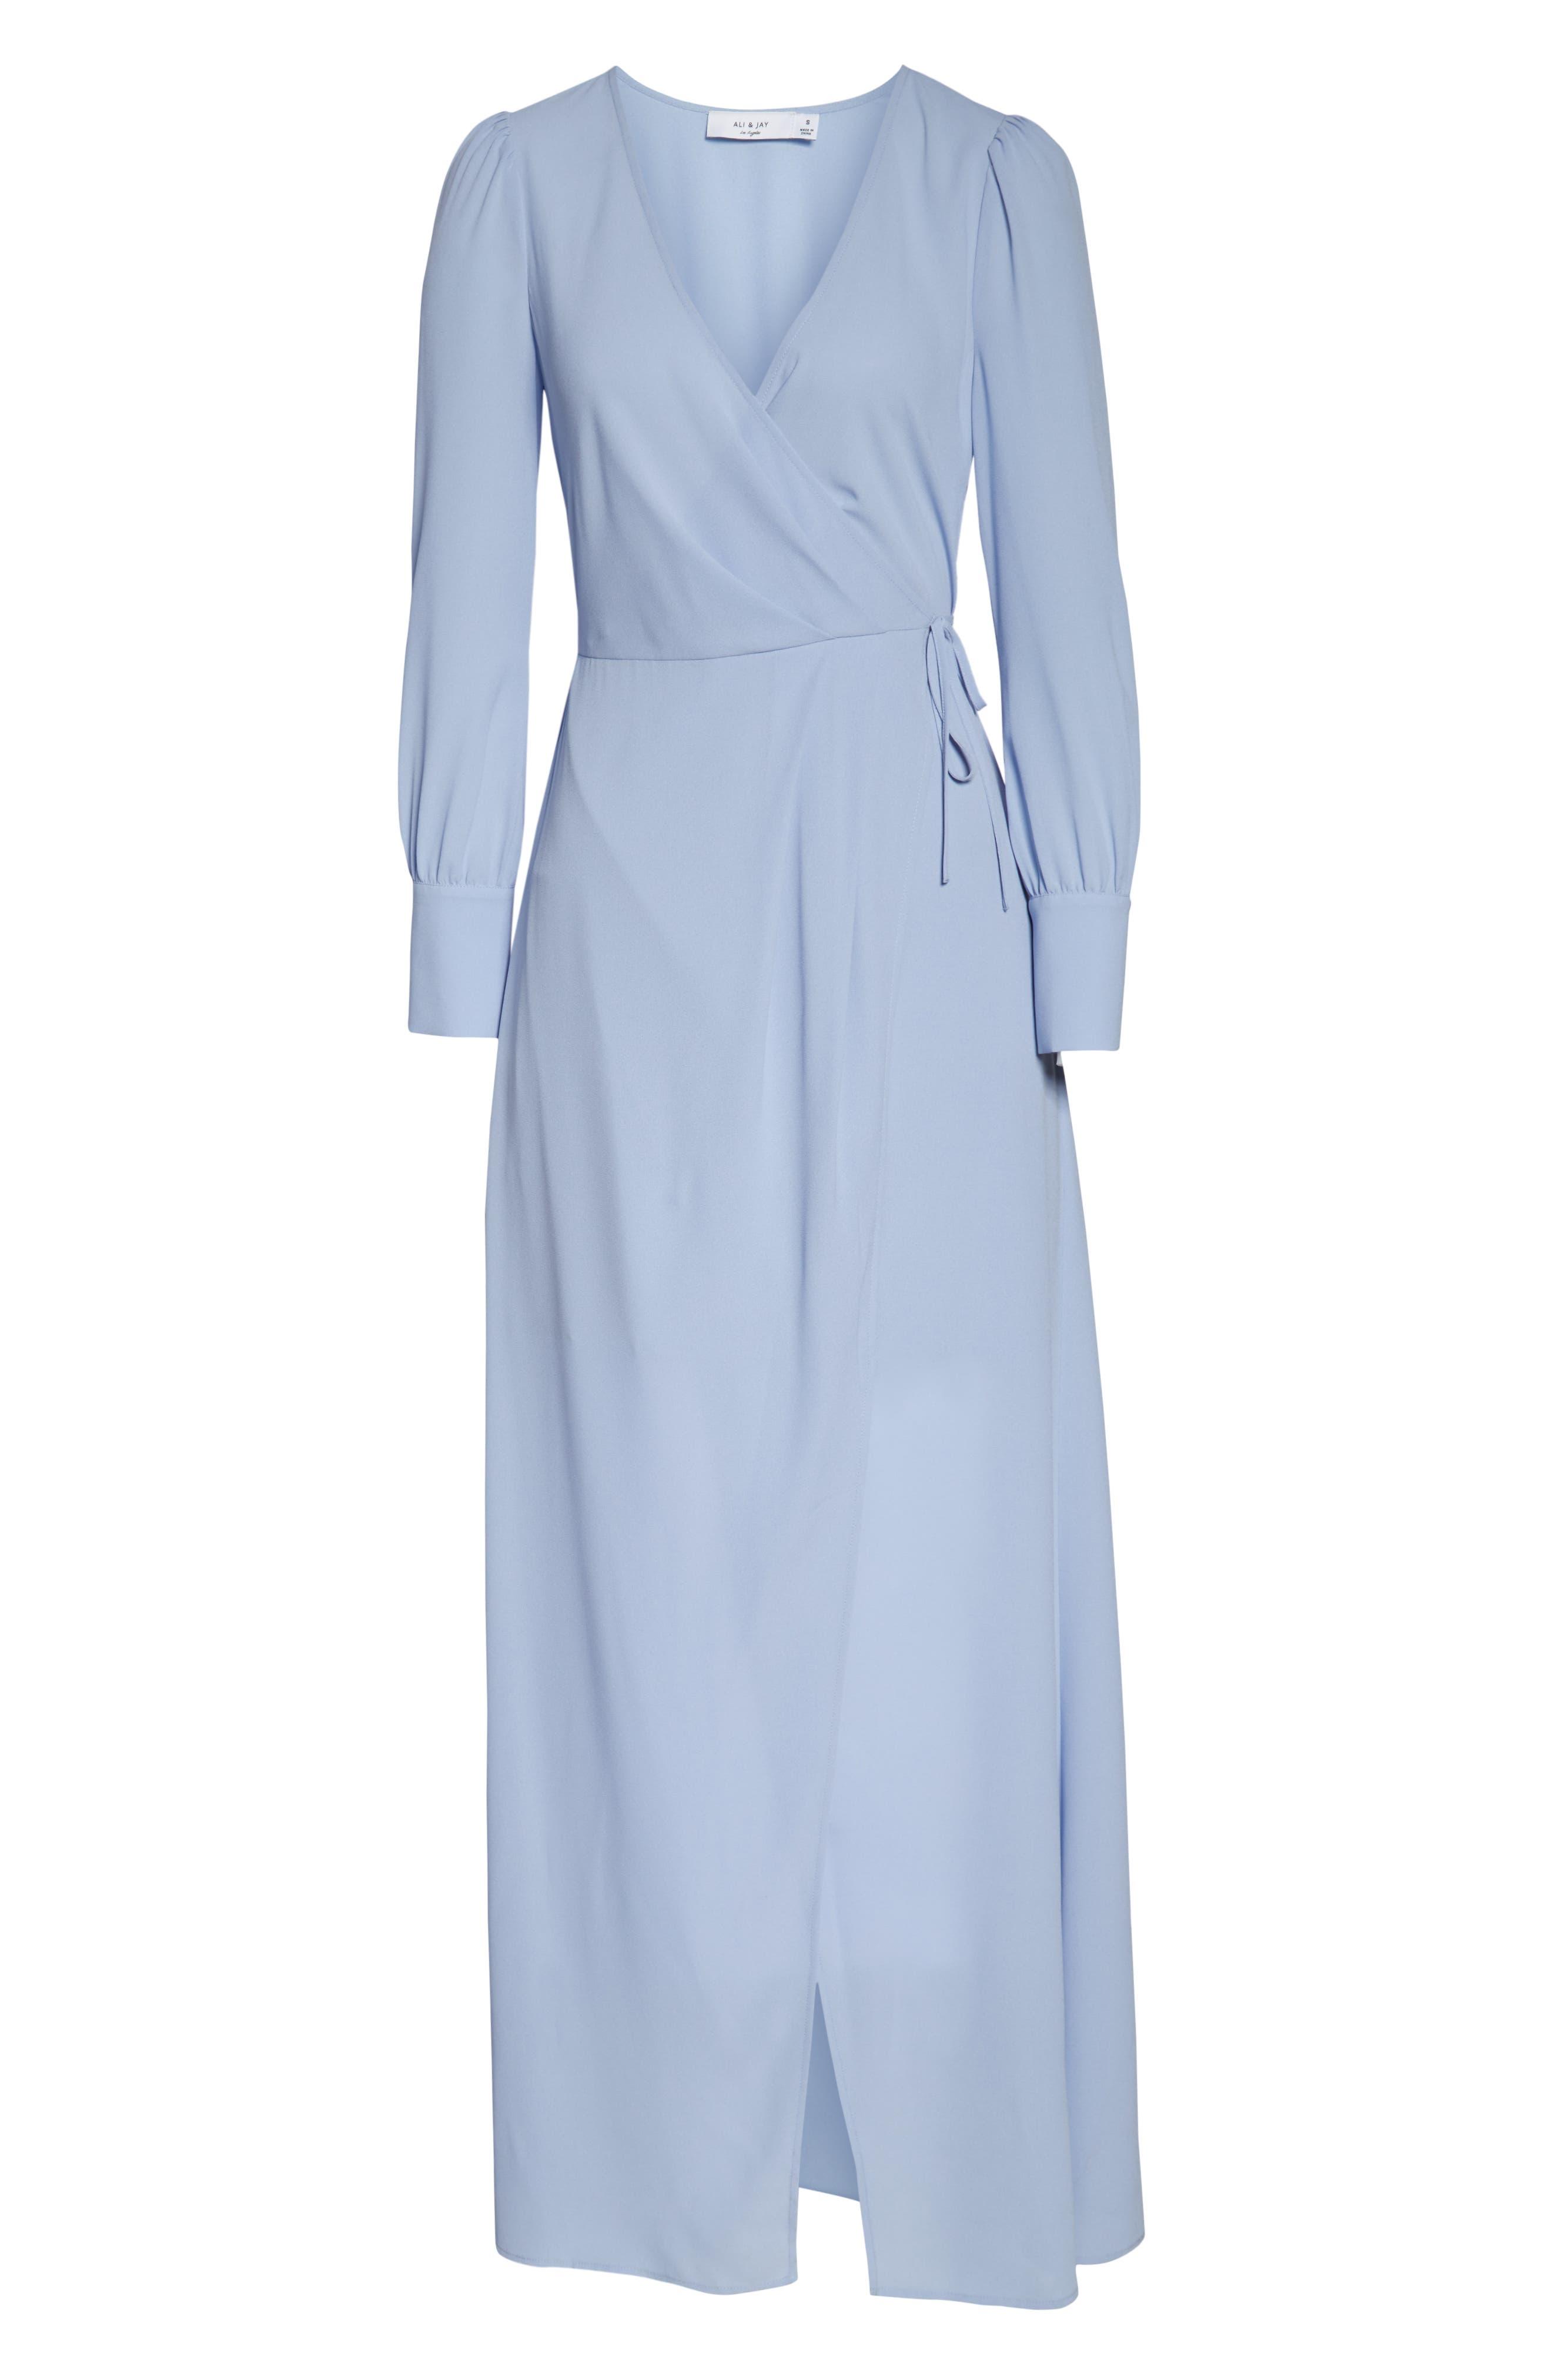 ALI & JAY, Garden Stroll Wrap Maxi Dress, Alternate thumbnail 7, color, 400